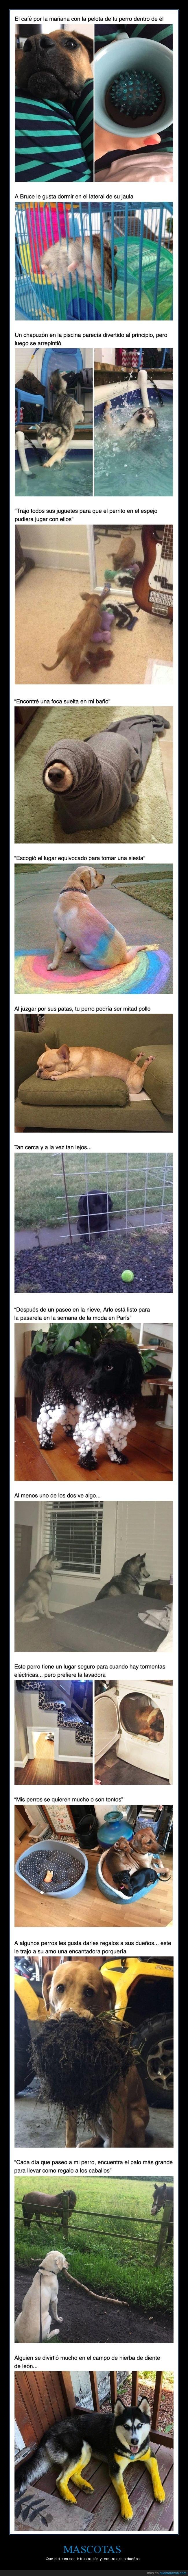 mascotas,perros,wtf